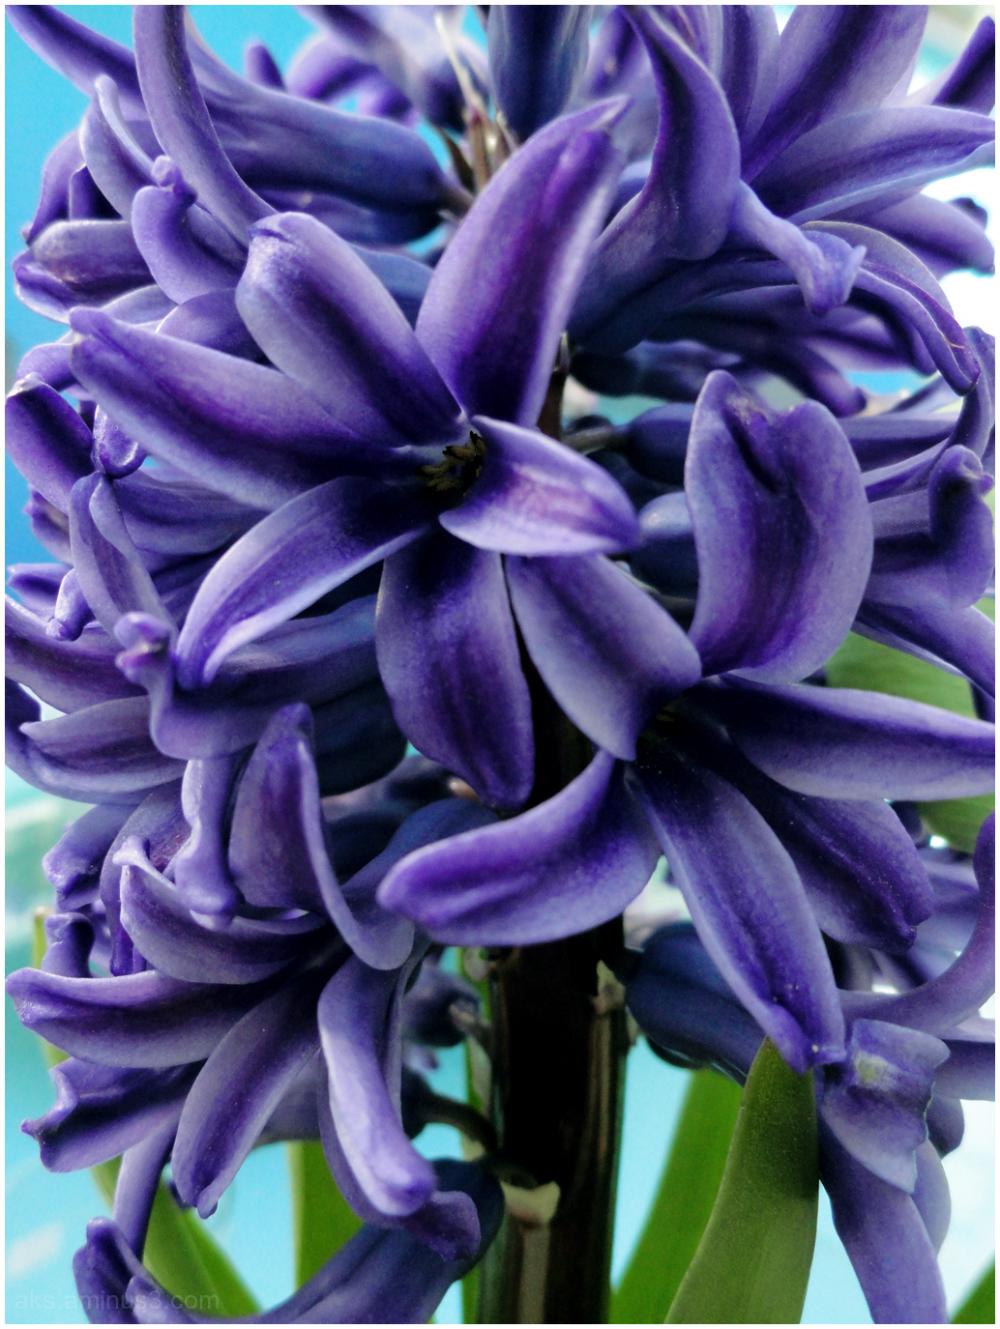 Vernal flowers